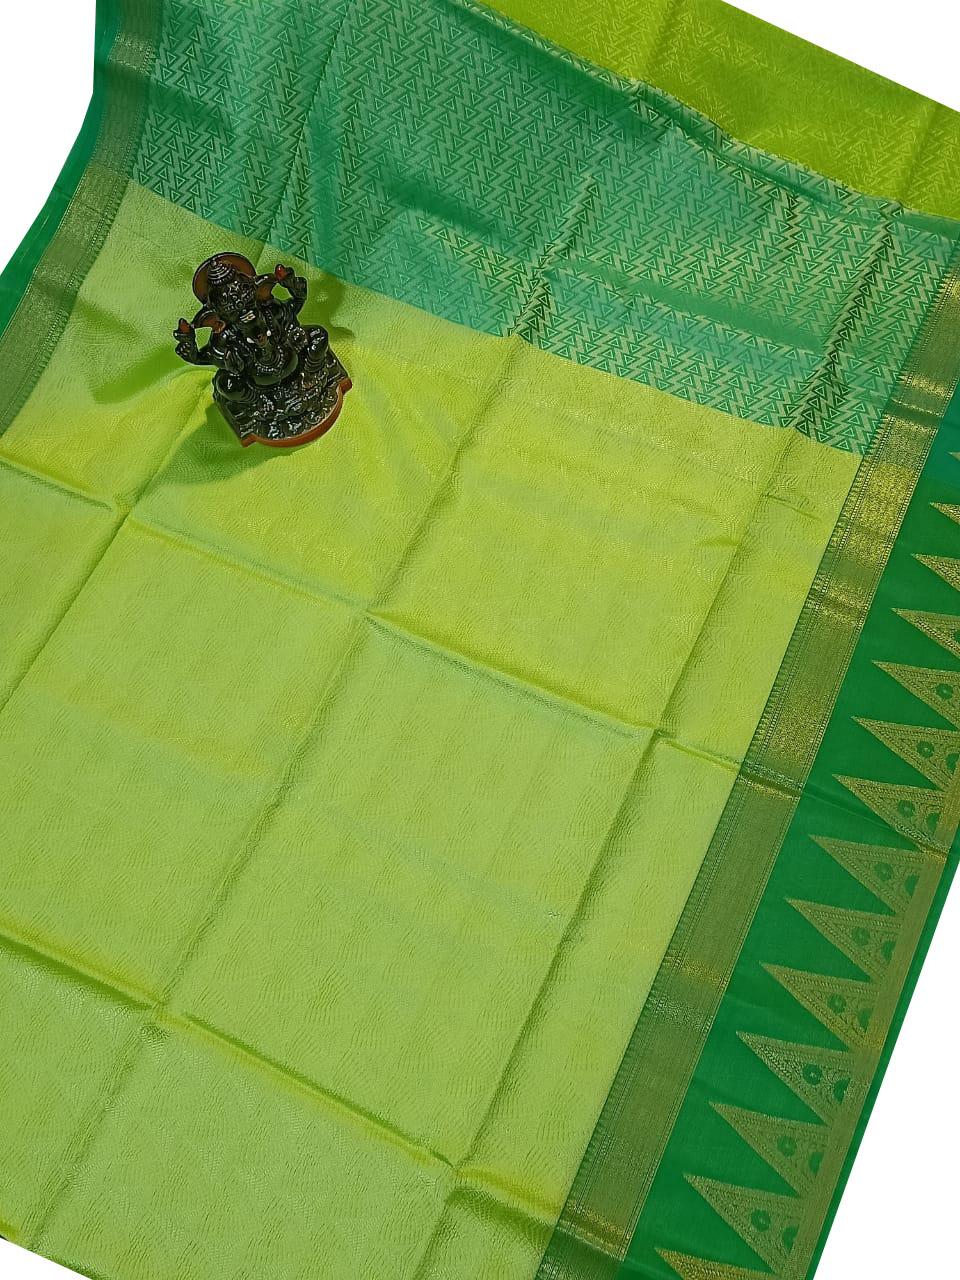 Deep green and Olive green kora silk saree with kuppatam border